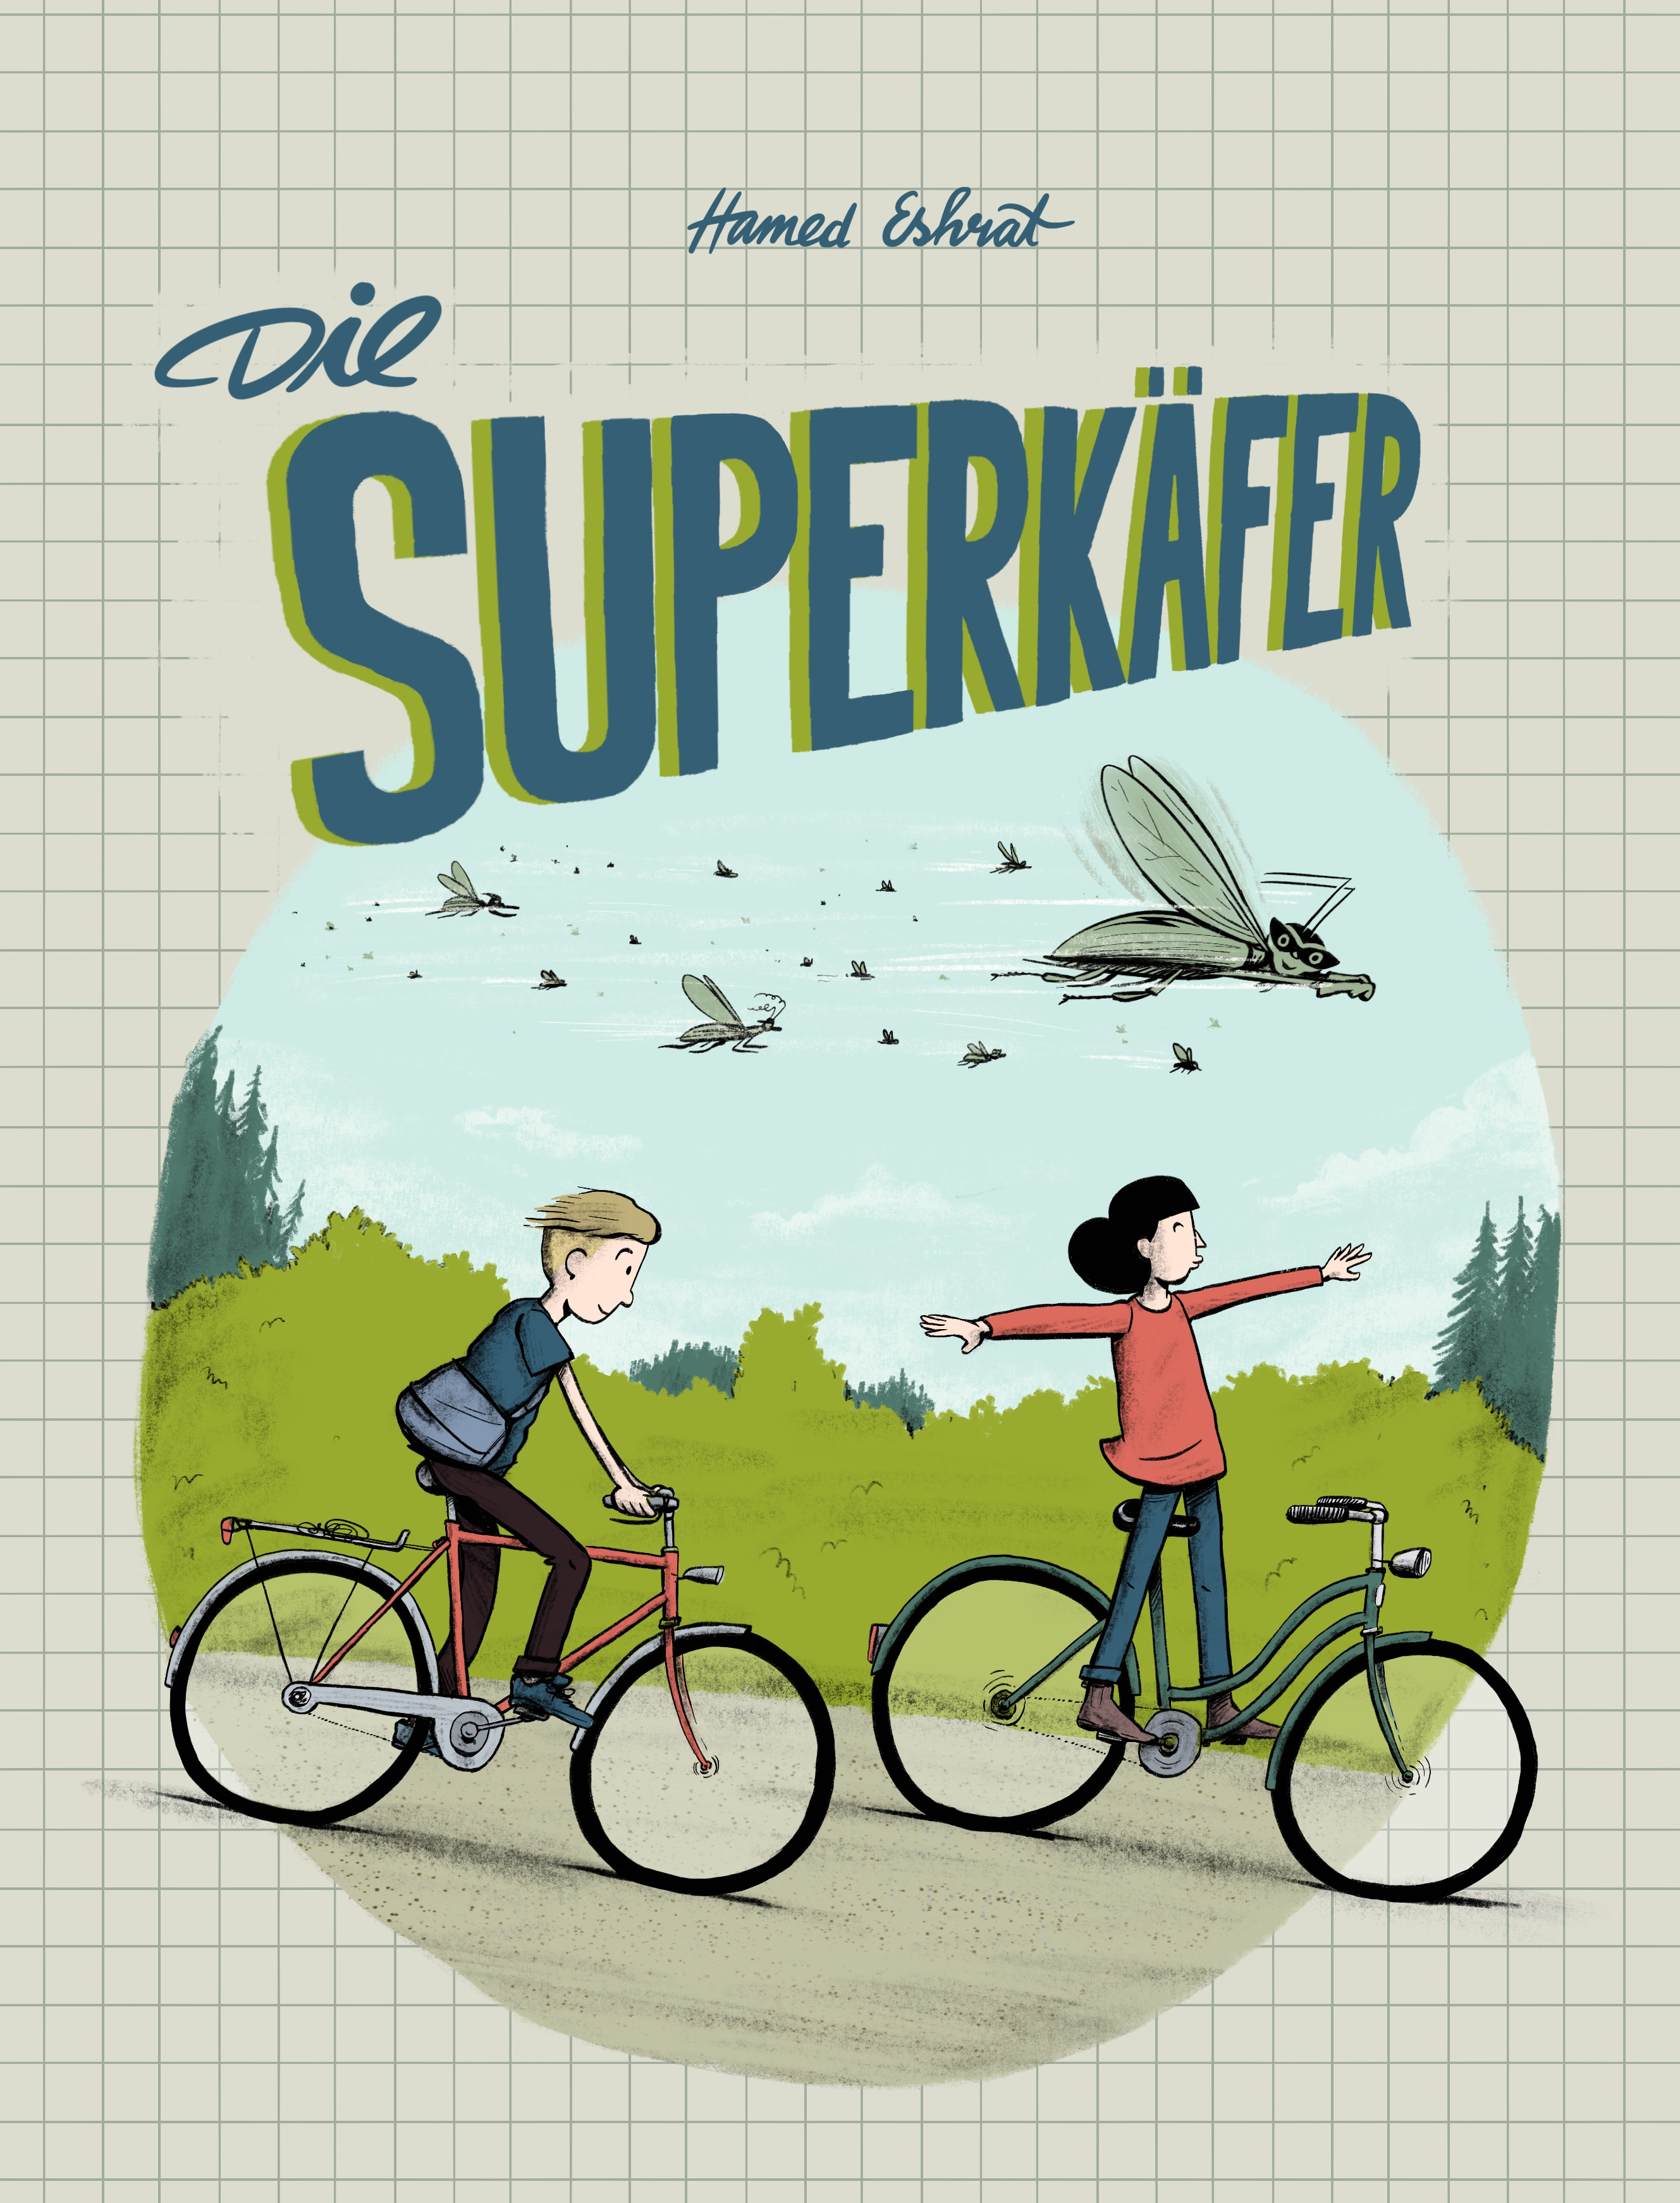 Die_Superkäfer_Cover_Hamed_Eshrat